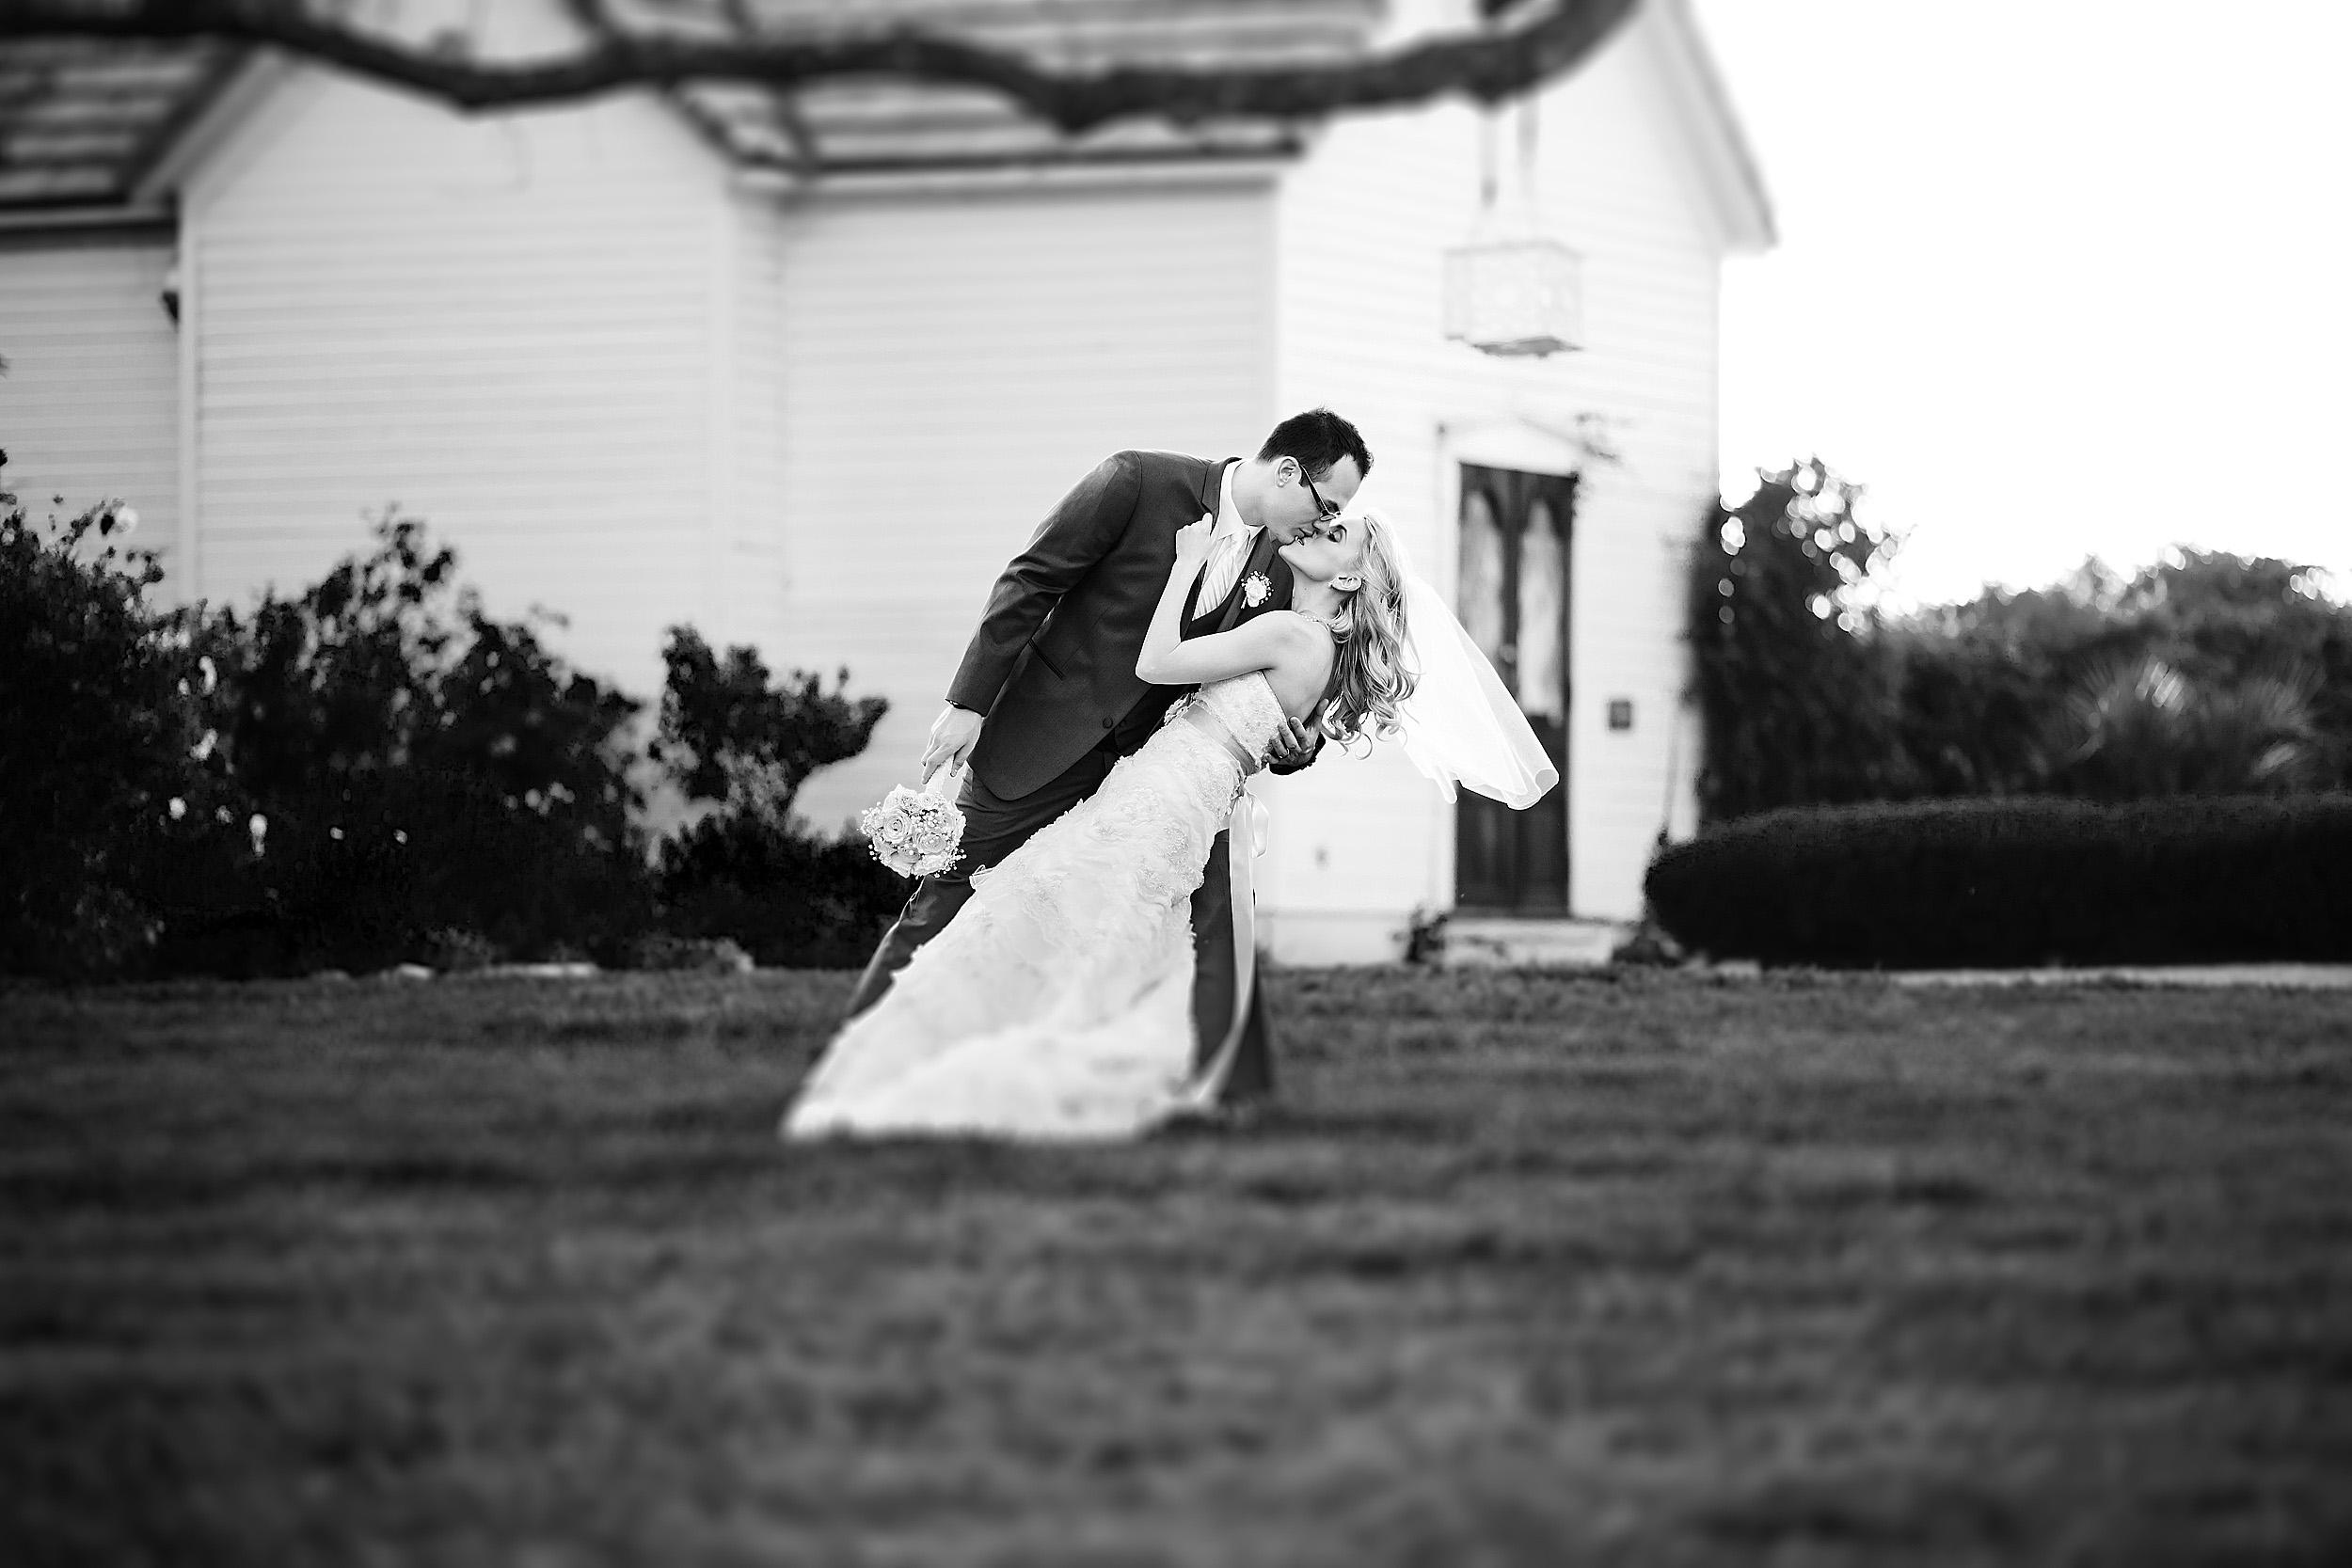 austin-wedding-mike-reed-12.jpg